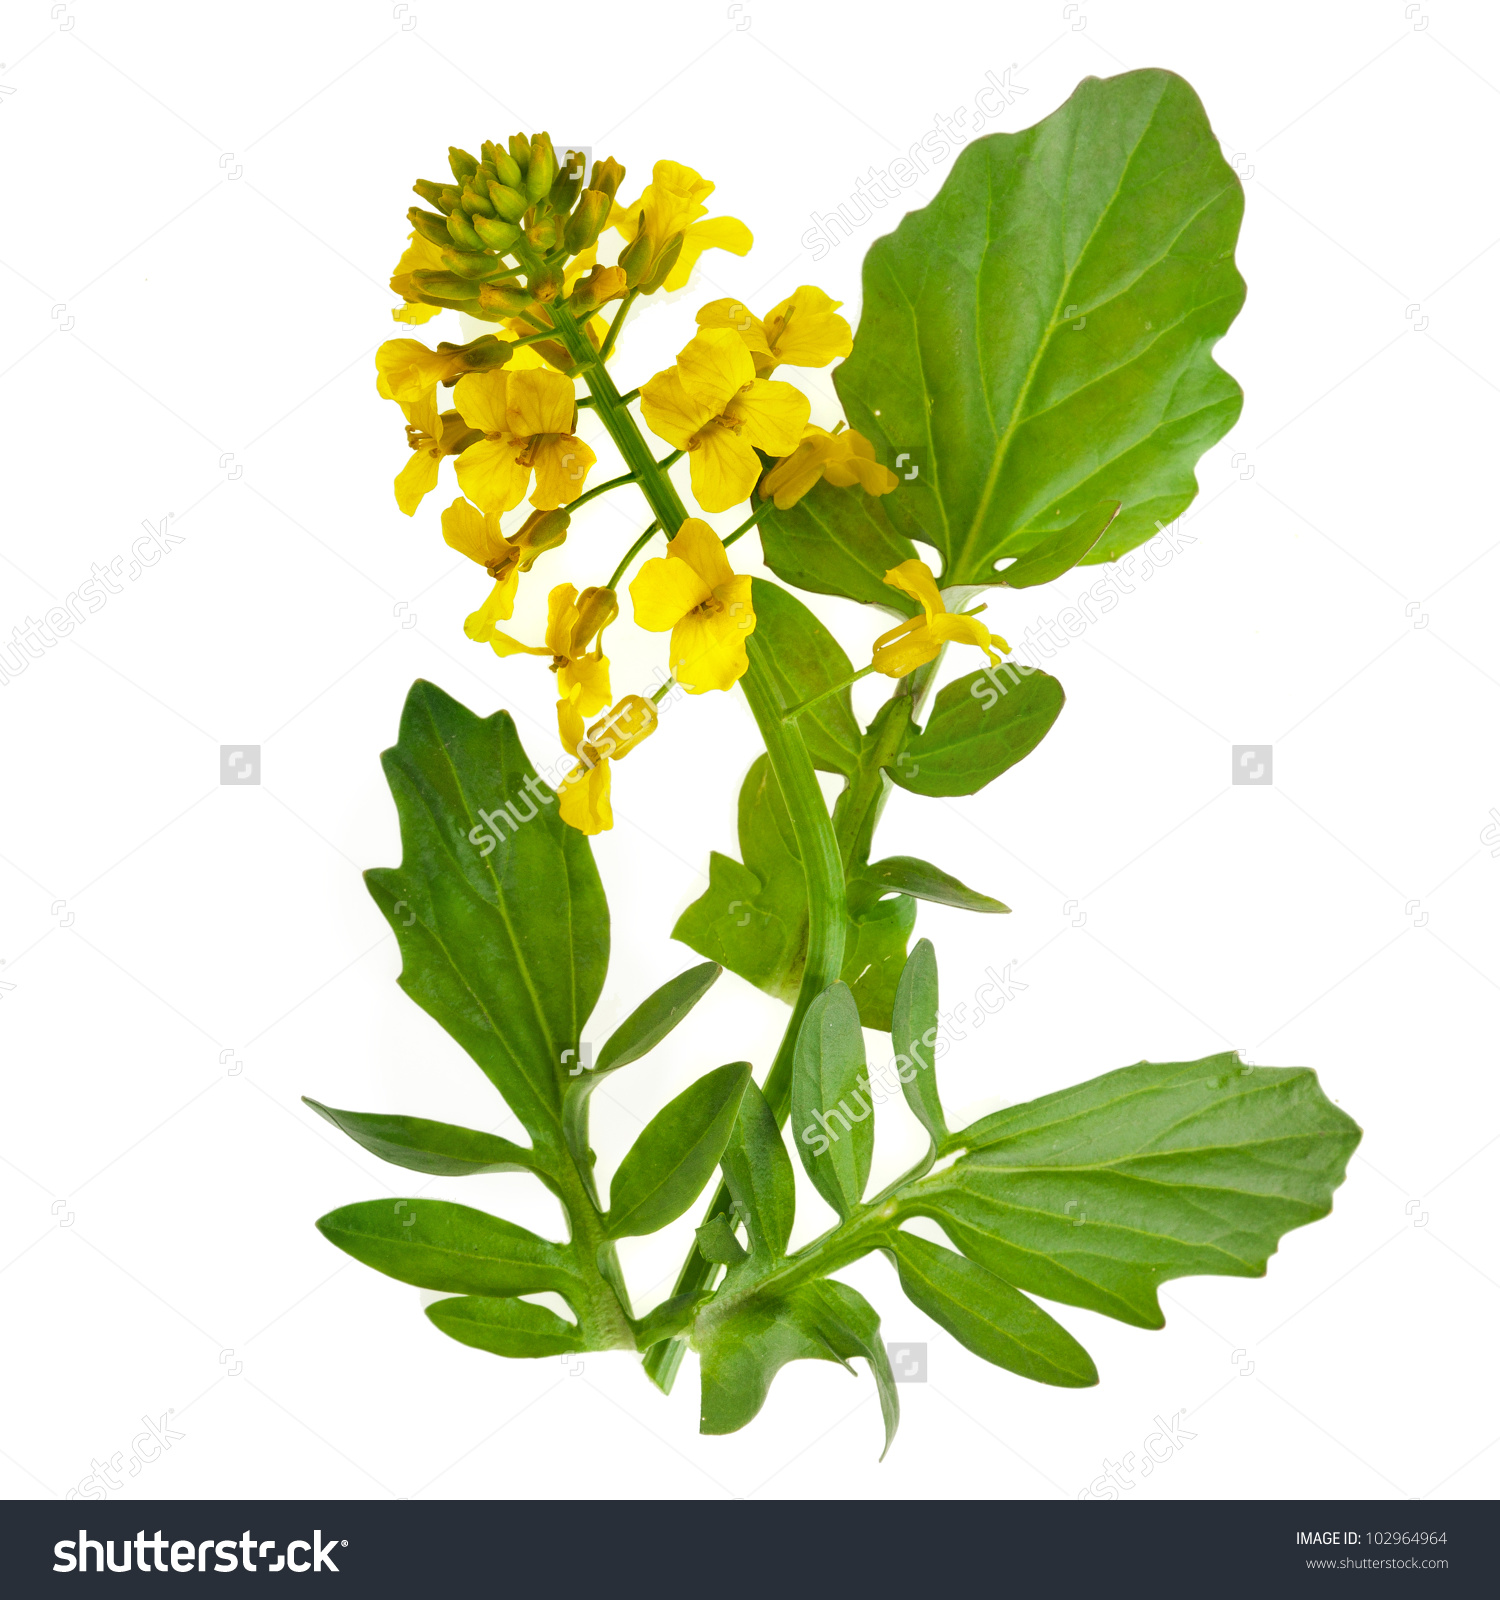 Flowering Barbarea Vulgaris Yellow Rocket Plant Stock Photo.